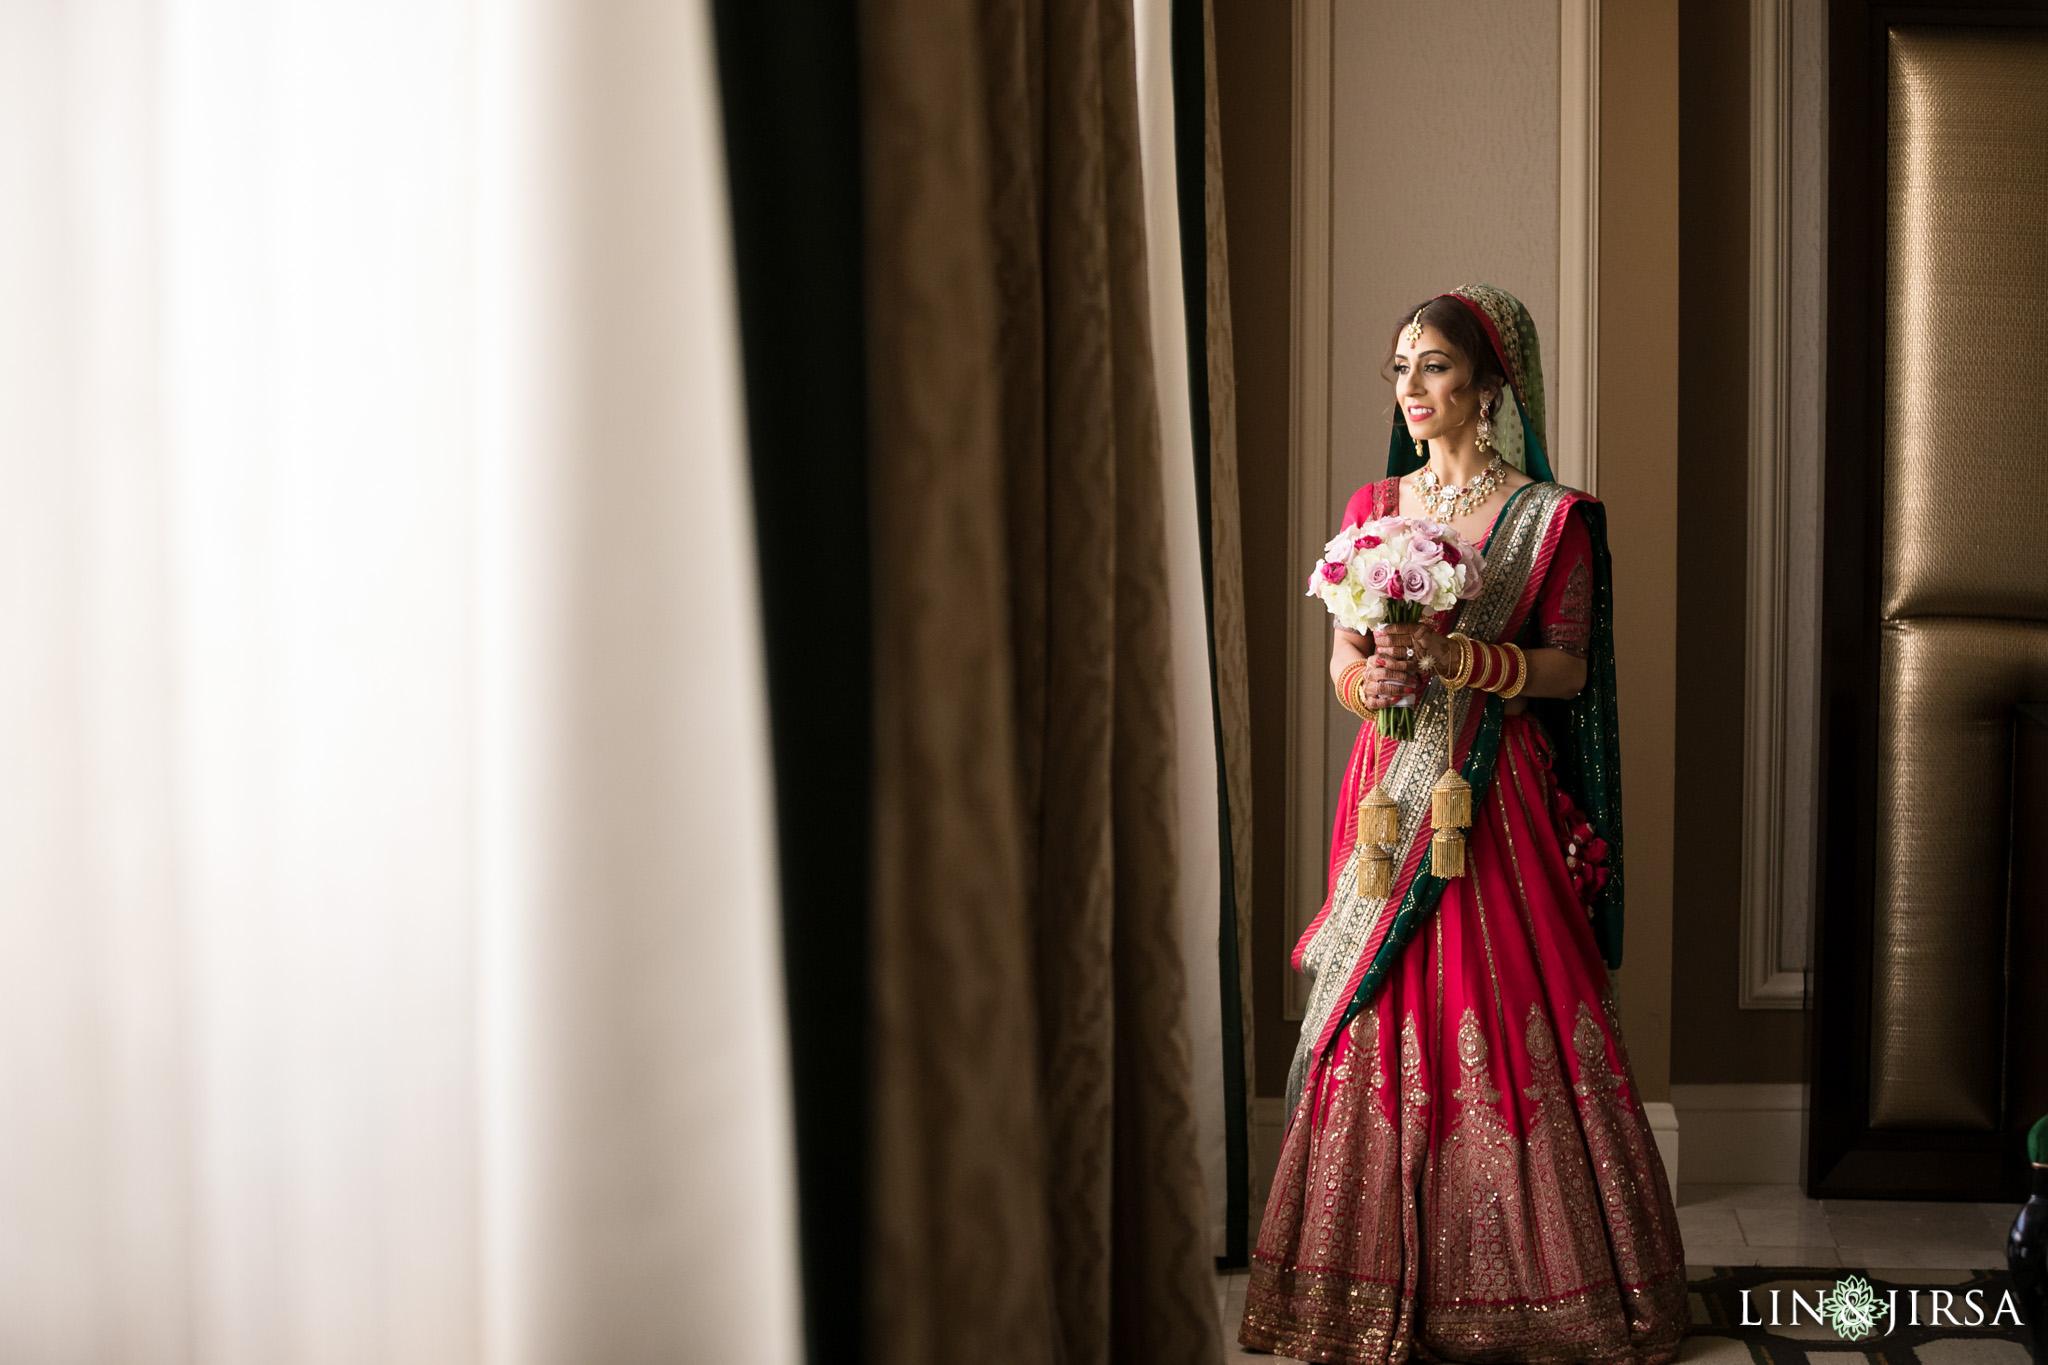 07-bellagio-las-vegas-indian-wedding-photography